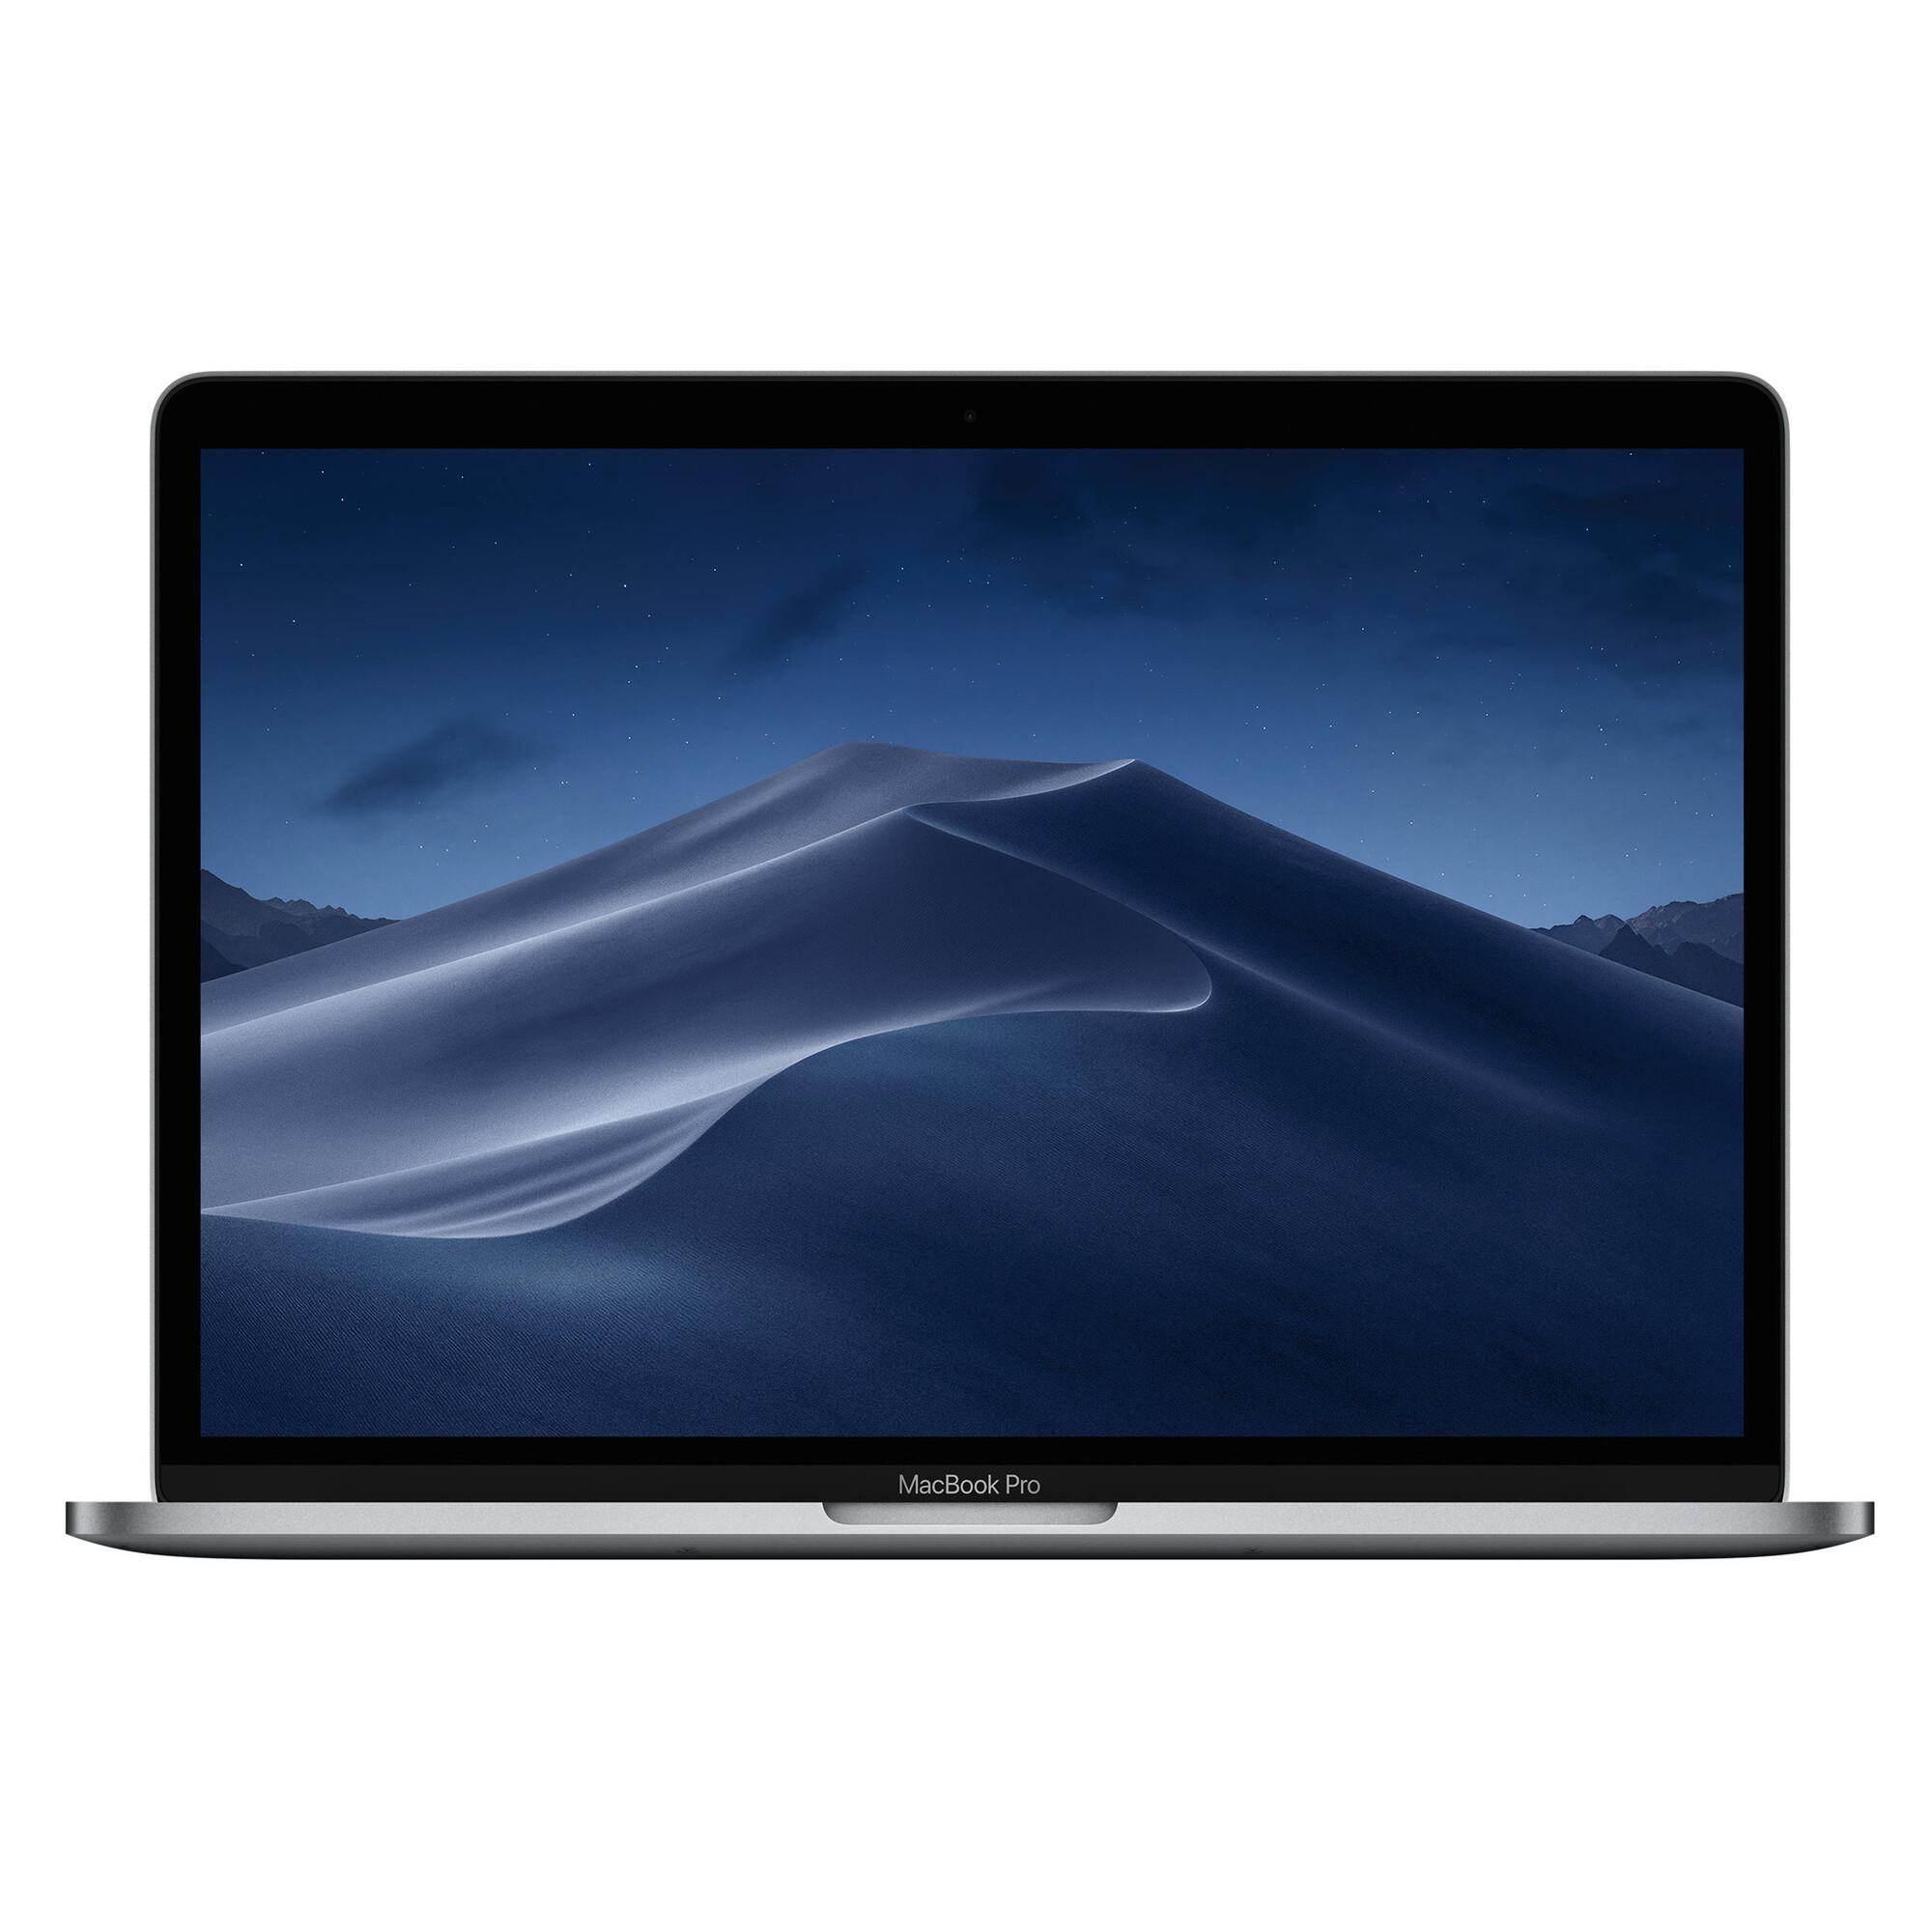 Apple Macbook Pro (2017) 13 i5-7360U 8GB RAM 128GB SSD Retina Display AZERTY (Zo goed als nieuw)